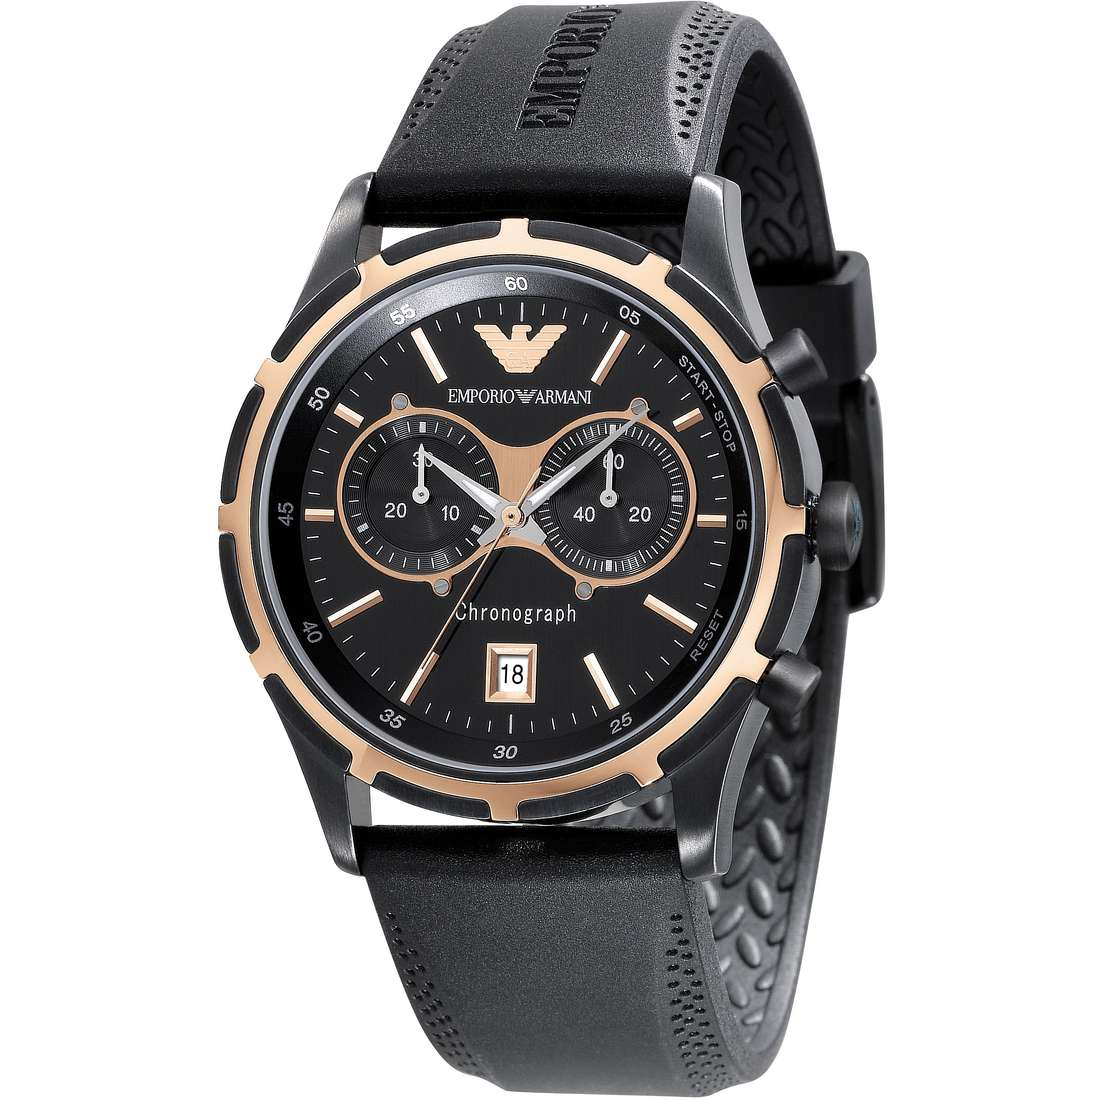 orologio cronografo uomo Emporio Armani AR0584